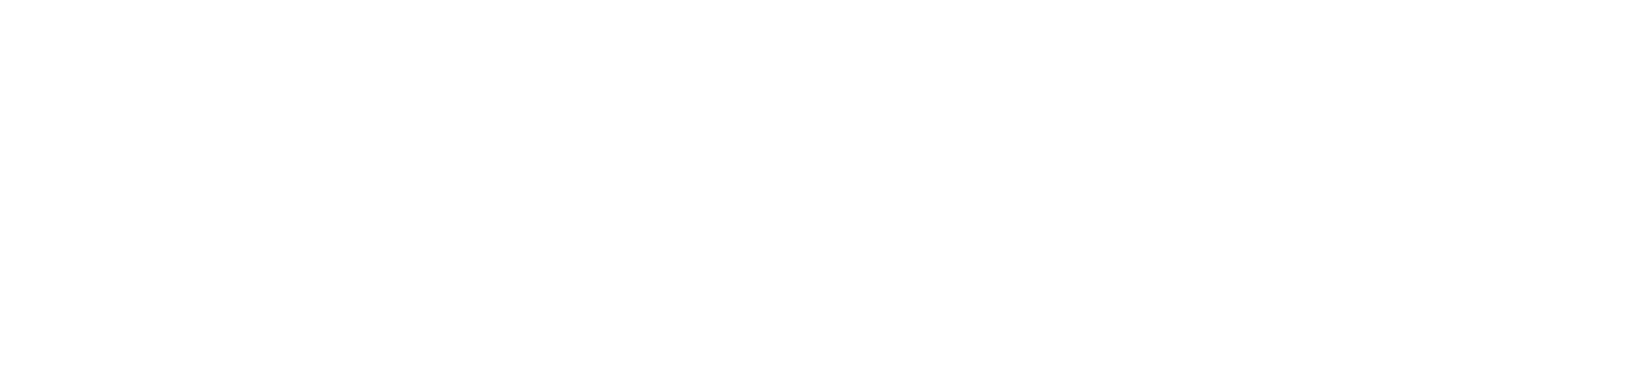 GOODWEATHER/G2W2